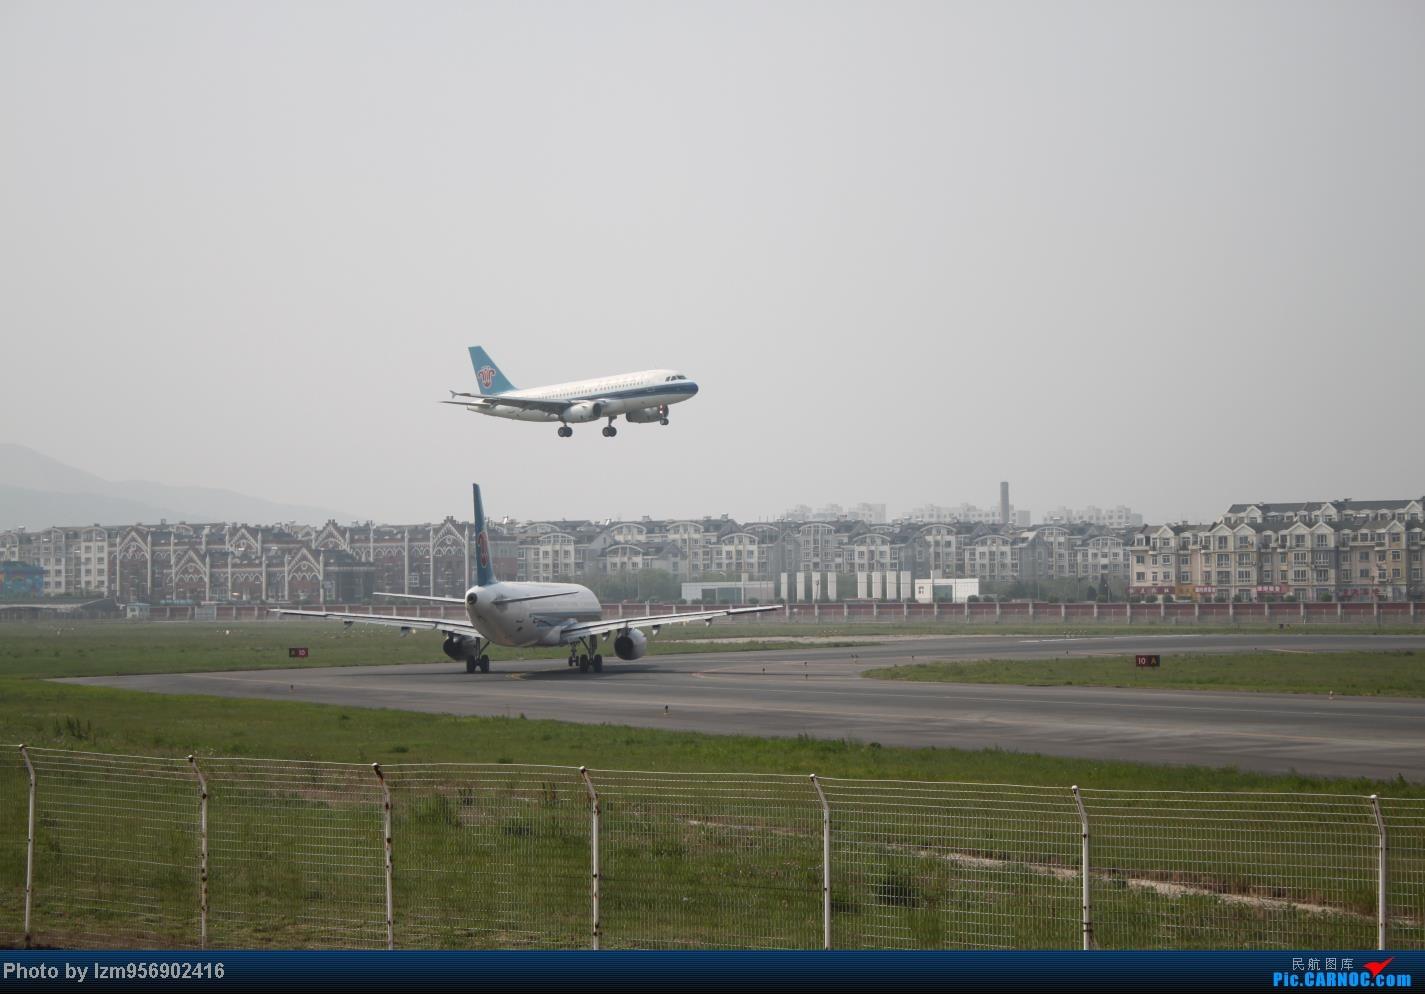 Re:[原创]DLC蹲点大半天,拍到了大棒航空772=w= AIRBUS A319-100 B-2297 中国大连周水子机场